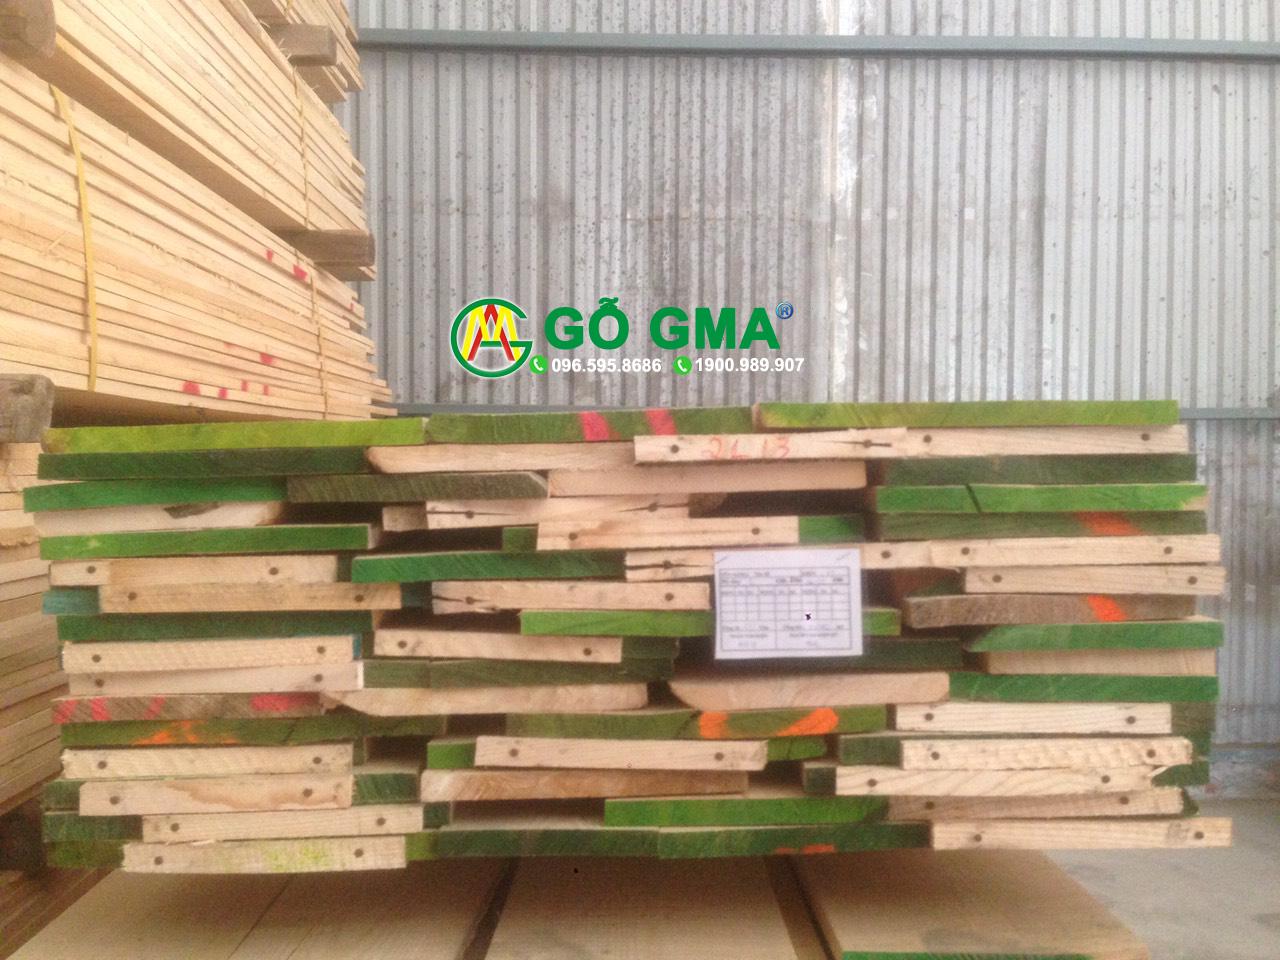 gotanbi 10-GMA Việt Nam